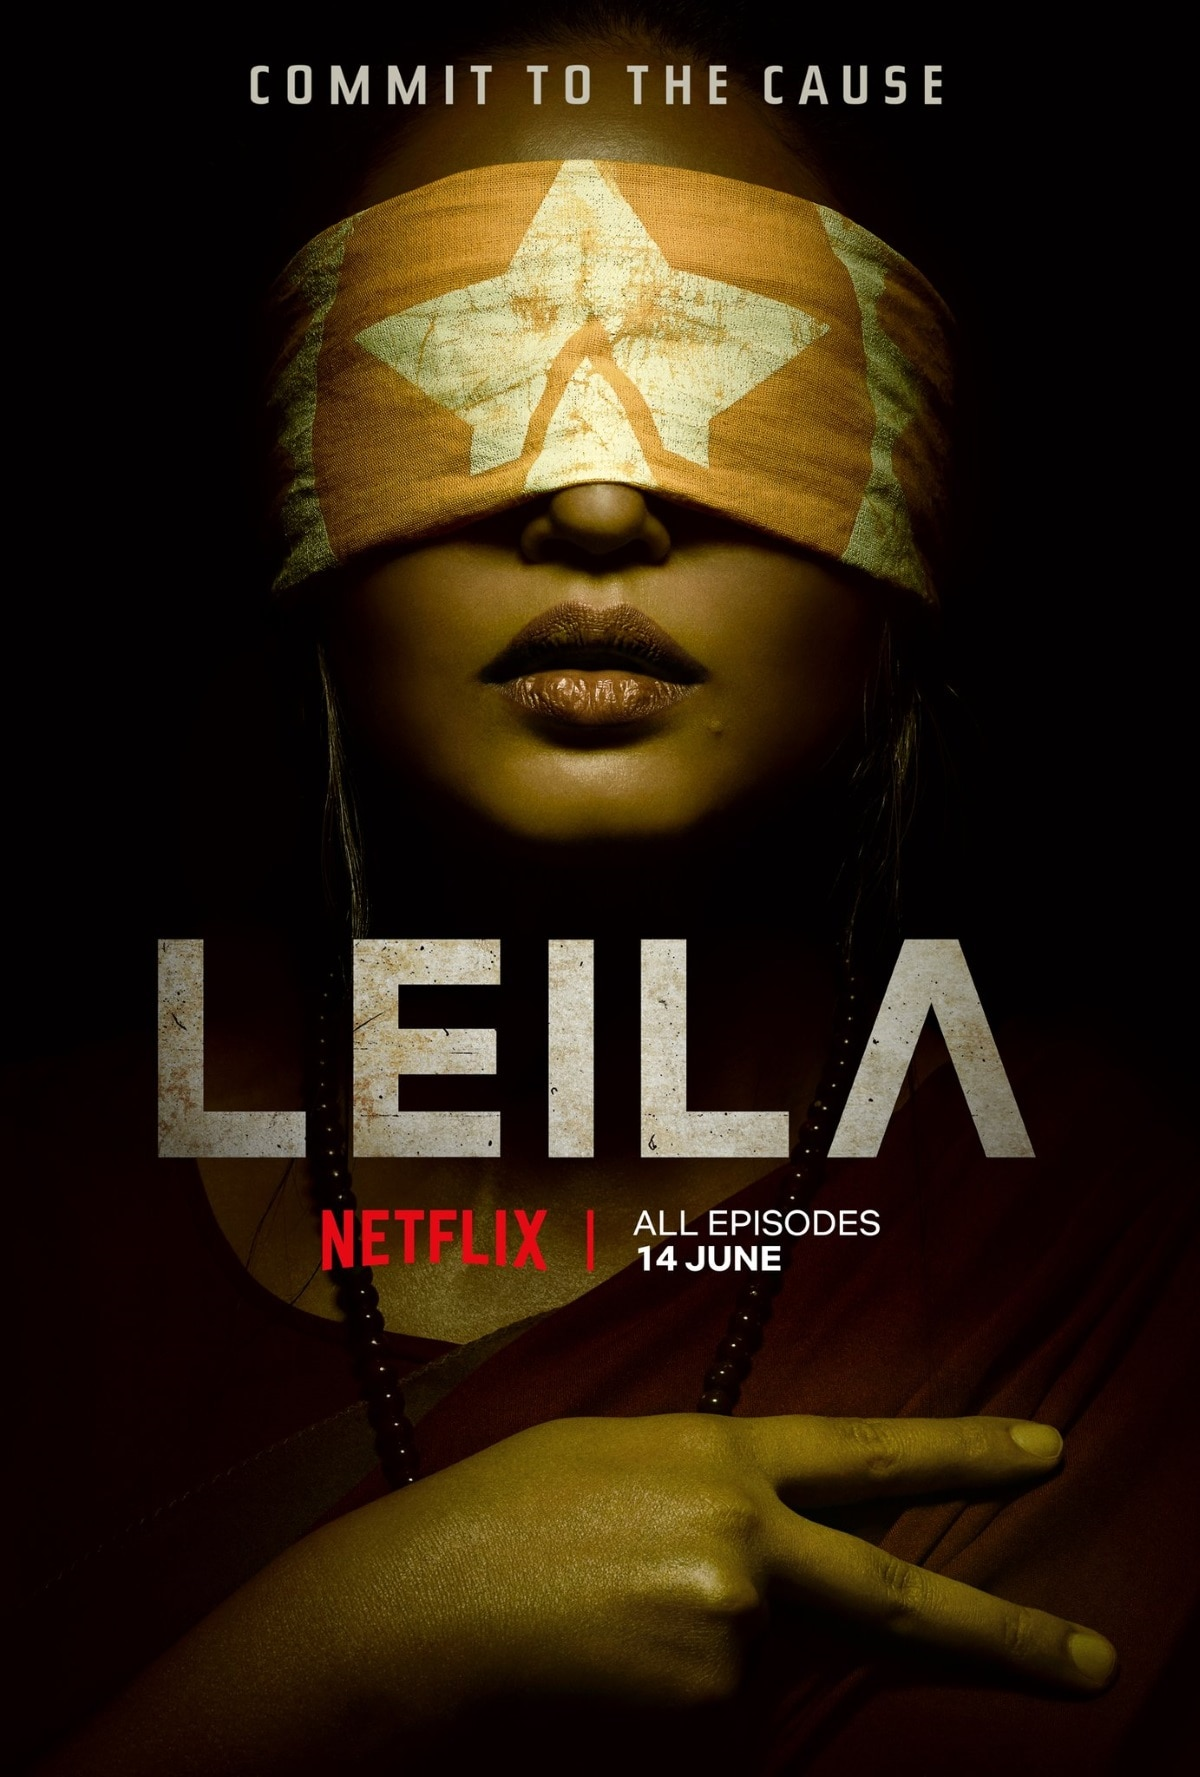 leila poster Leila poster